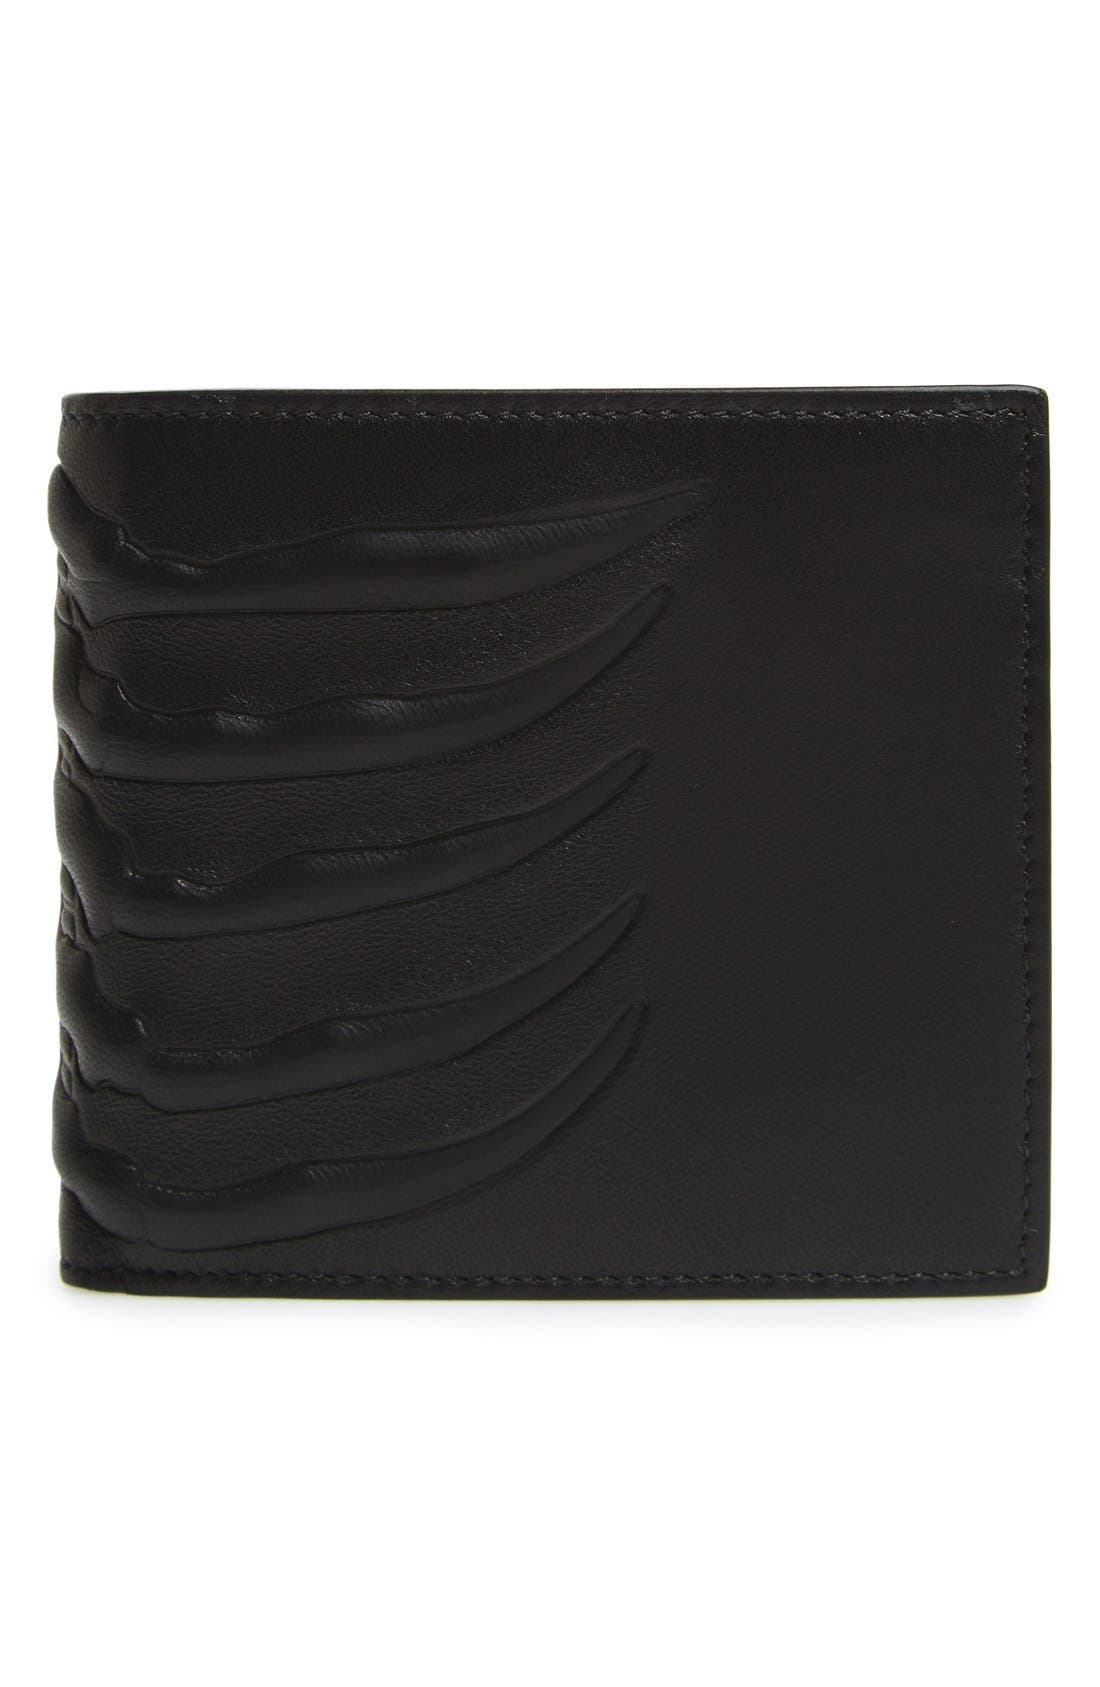 Ribcage Leather Wallet,                             Main thumbnail 1, color,                             001